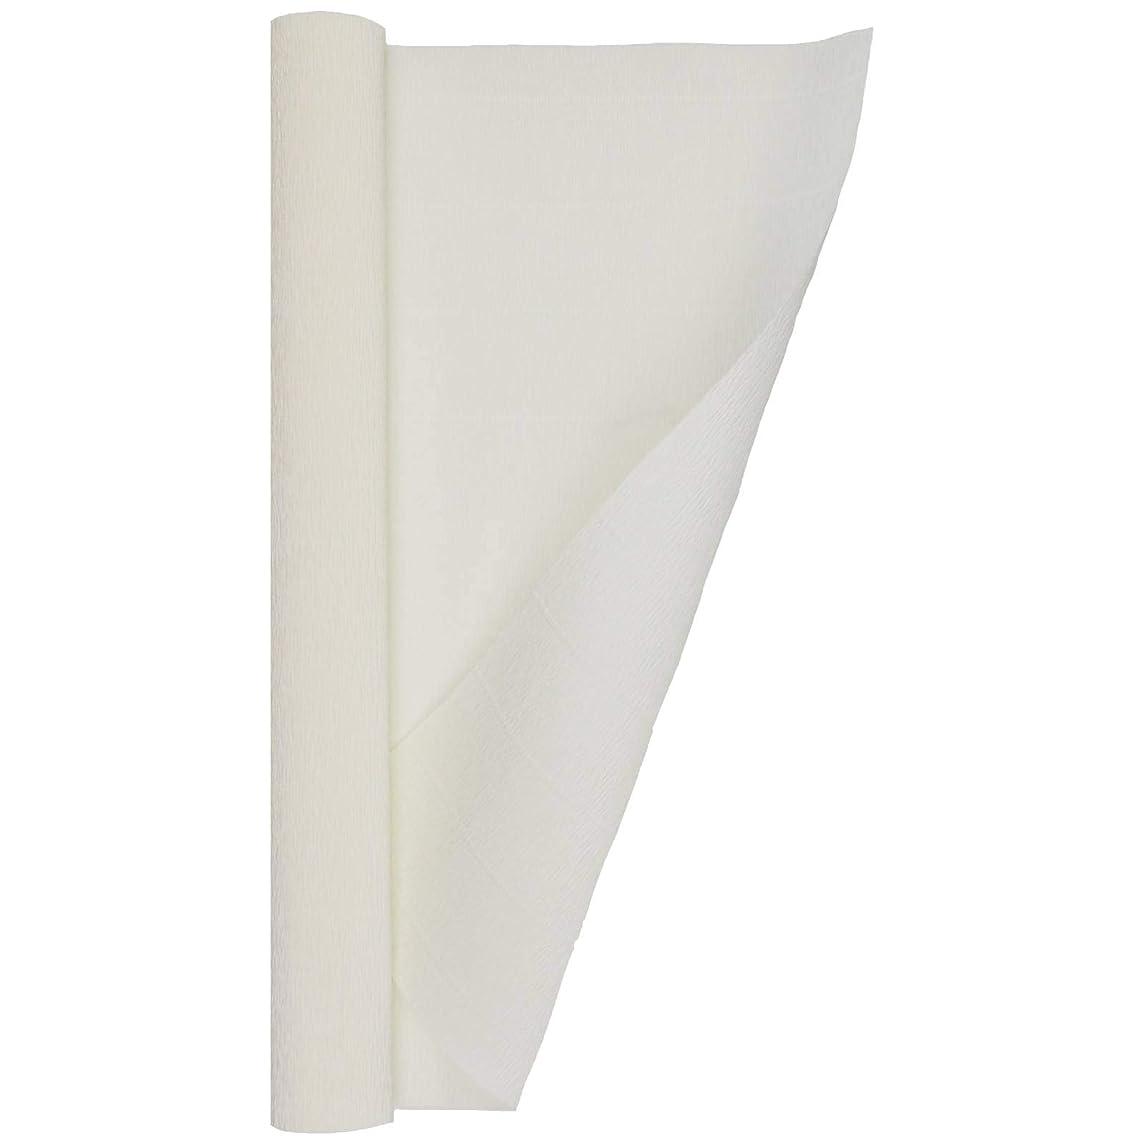 Crepe Paper Roll, Heavy Italian 140 g, 13.3 sqft, White Cream